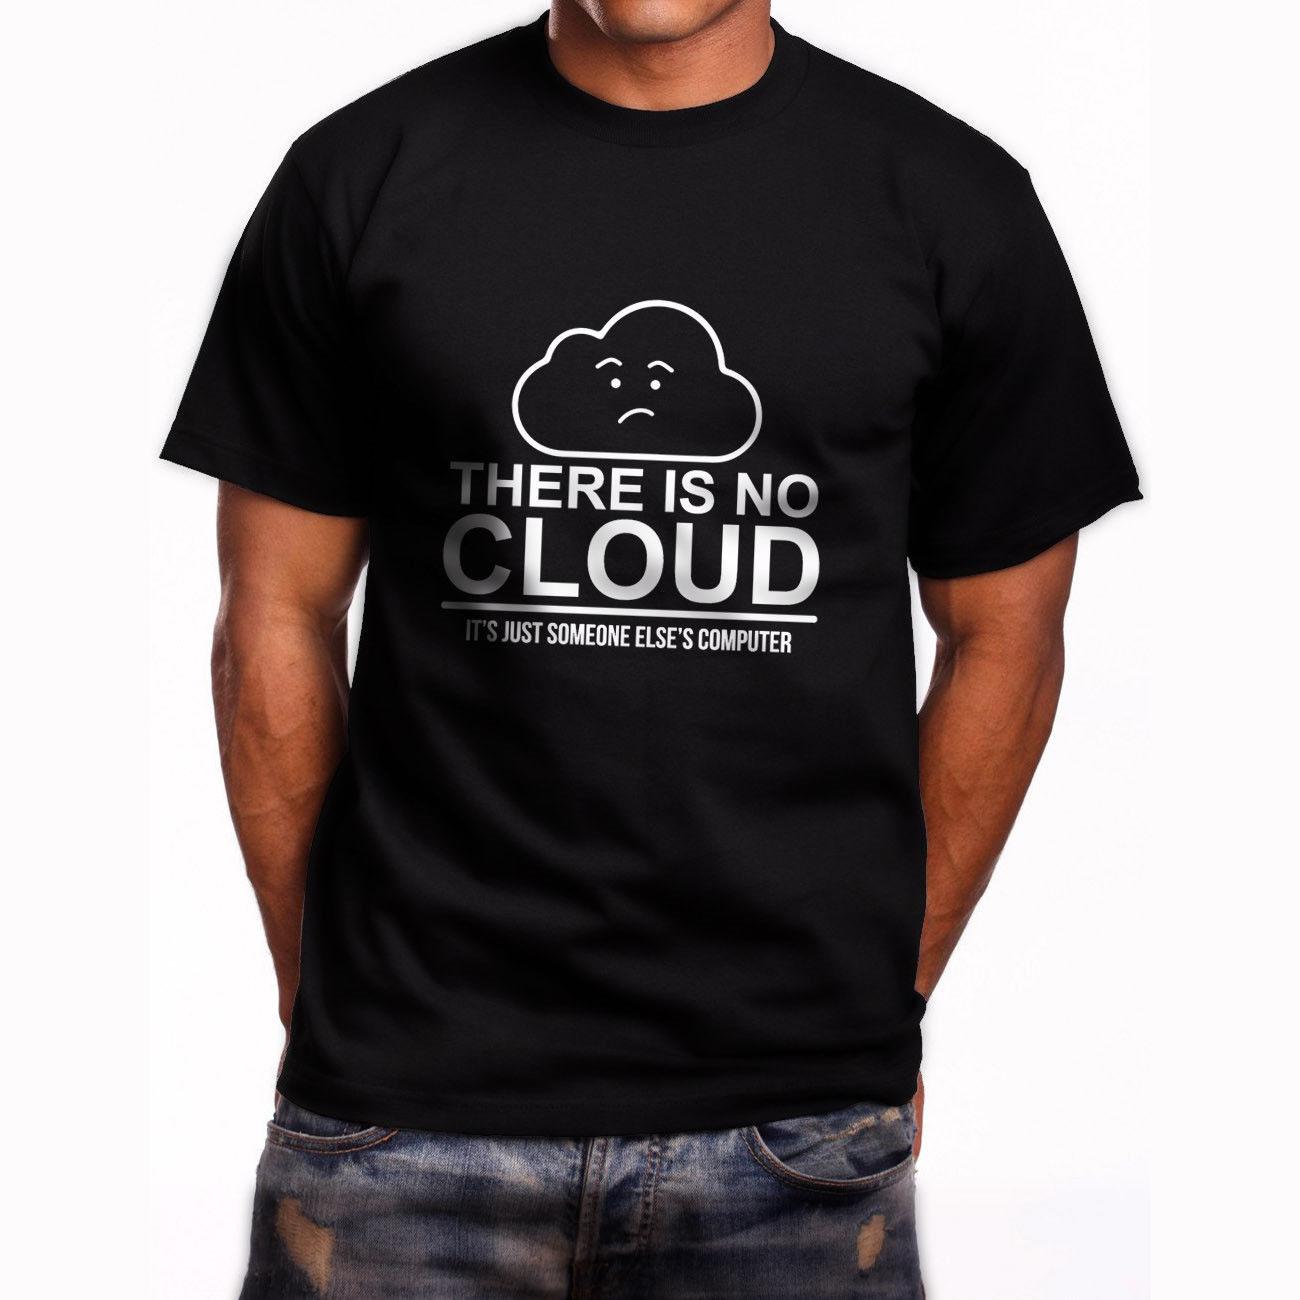 No Cloud Just Someone Elses Computer Short Sleeve Mens Black T-Shirt Summer Short Sleeves Cotton Fashion t Shirt